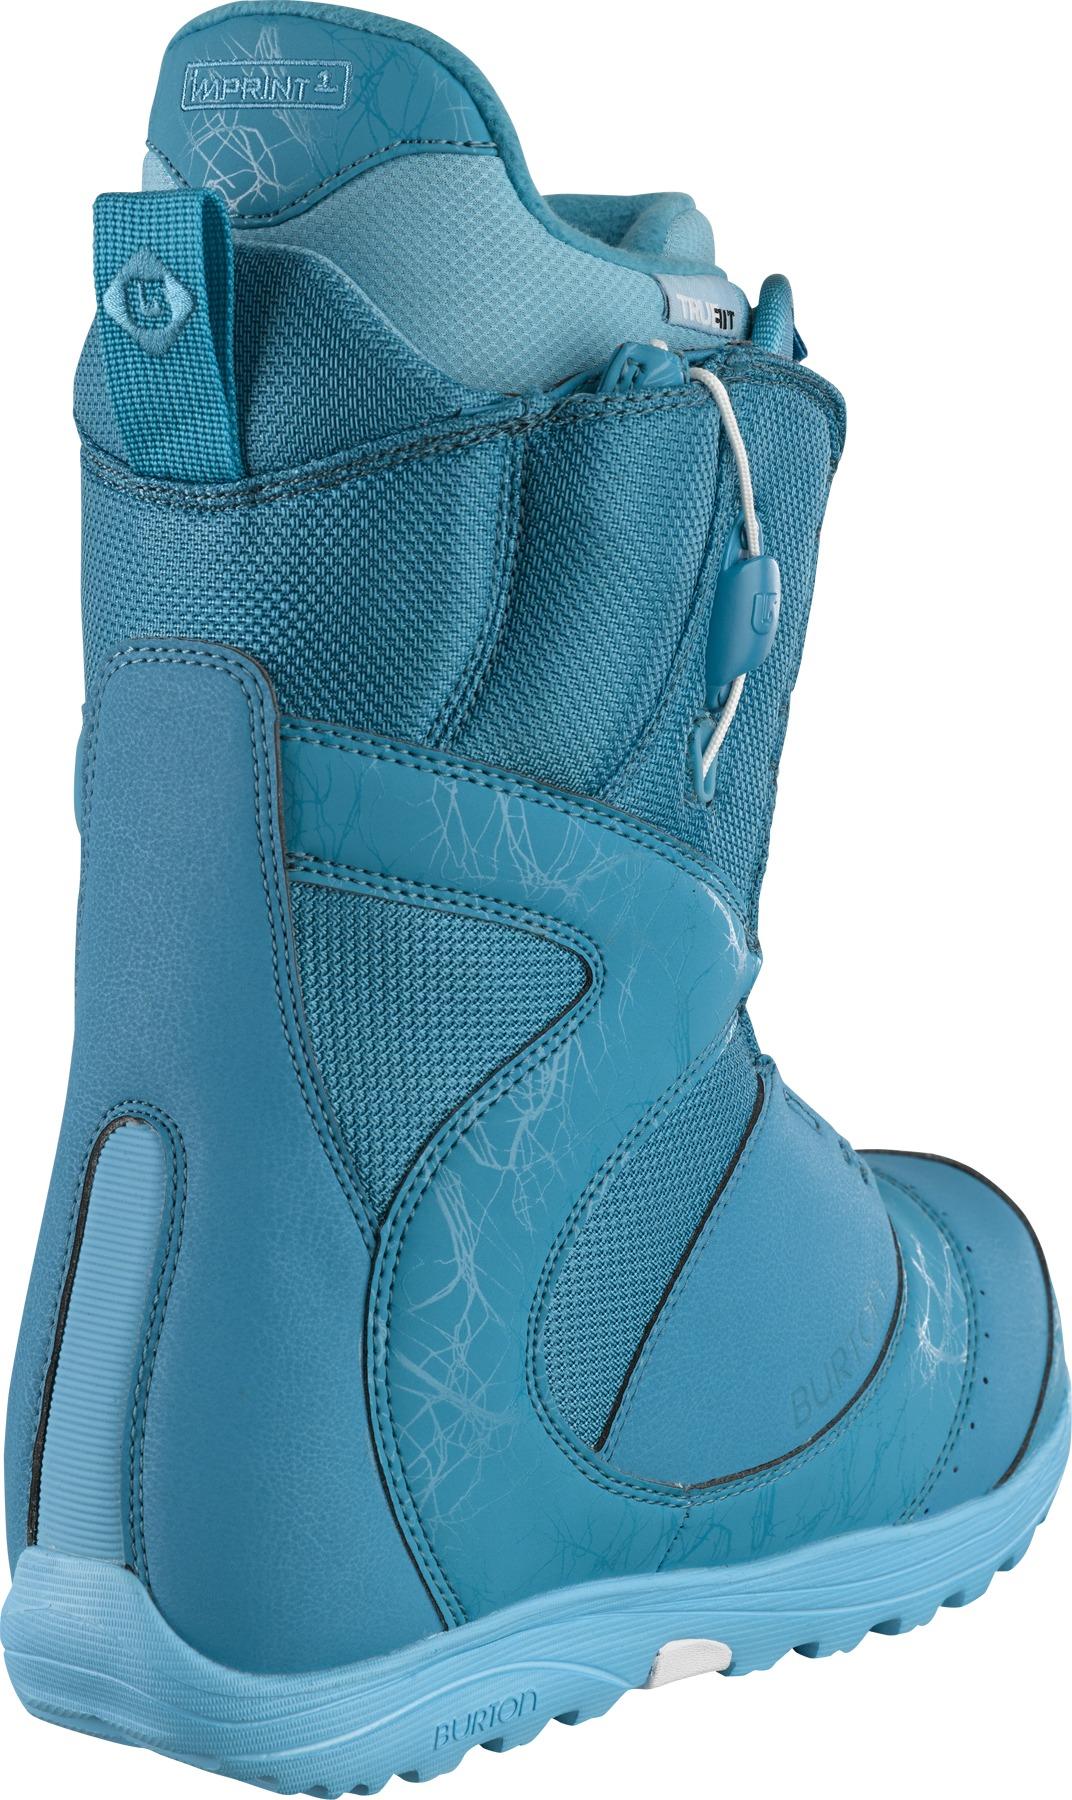 Buty Snowboardowe Burton Mint (Teal Deal)